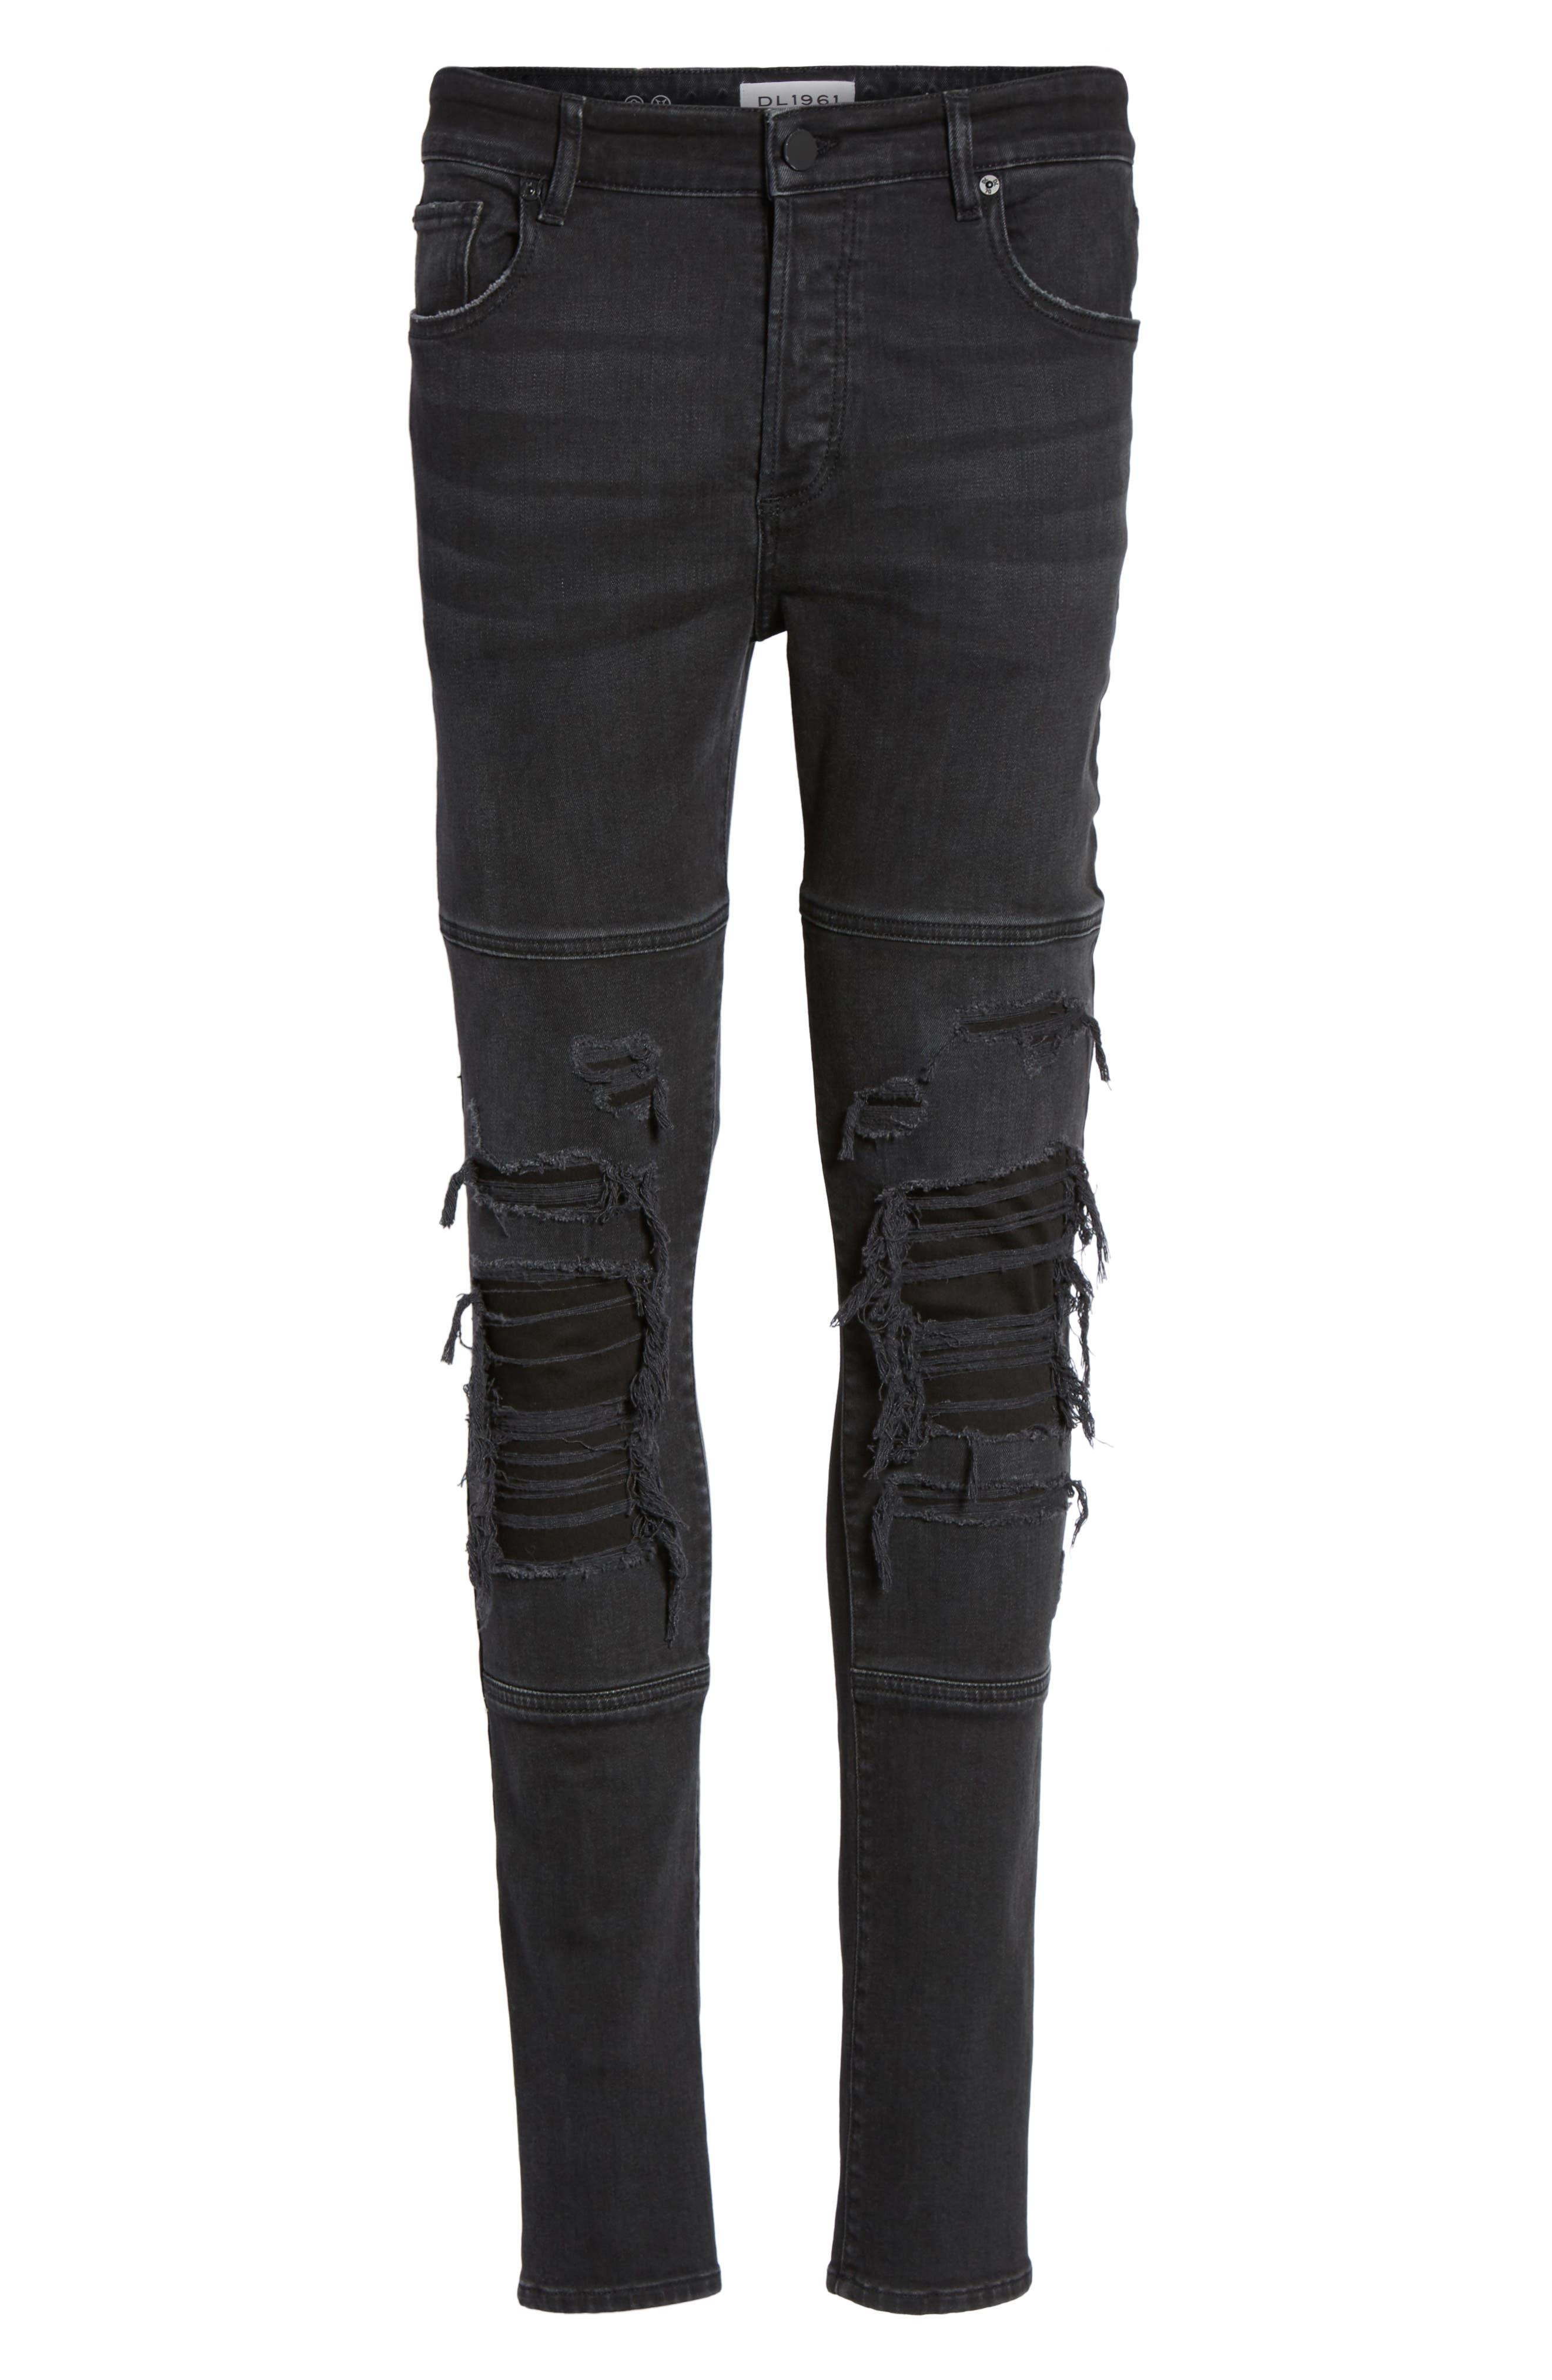 Hunter Skinny Jeans,                             Alternate thumbnail 6, color,                             001